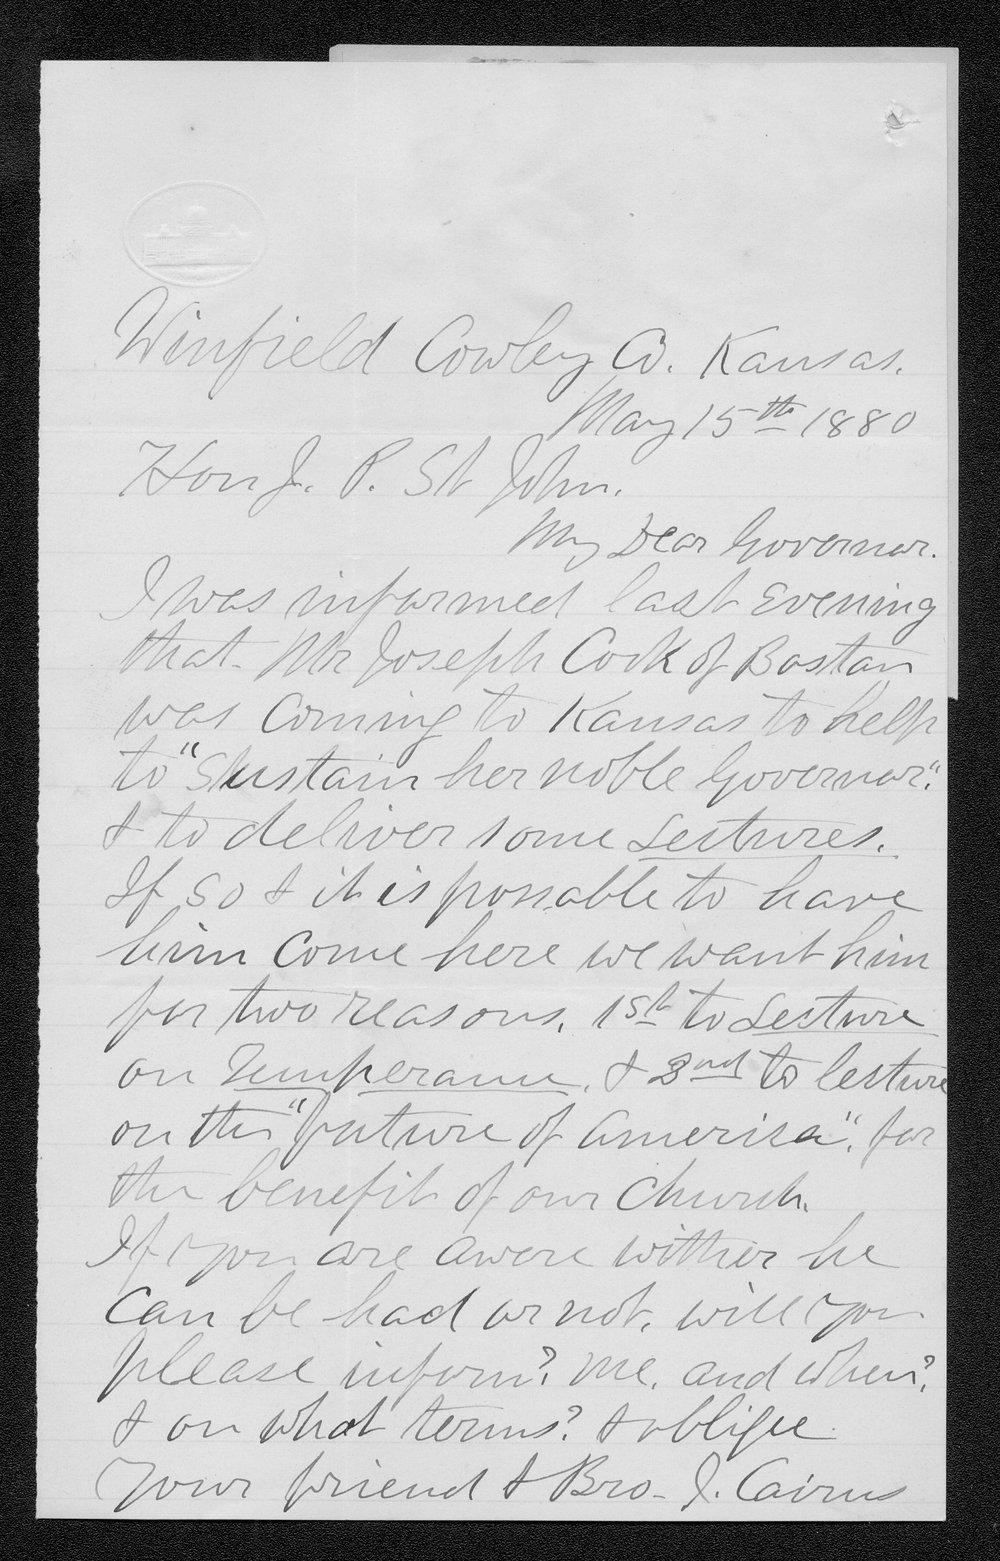 J. Cairns to Governor John St. John